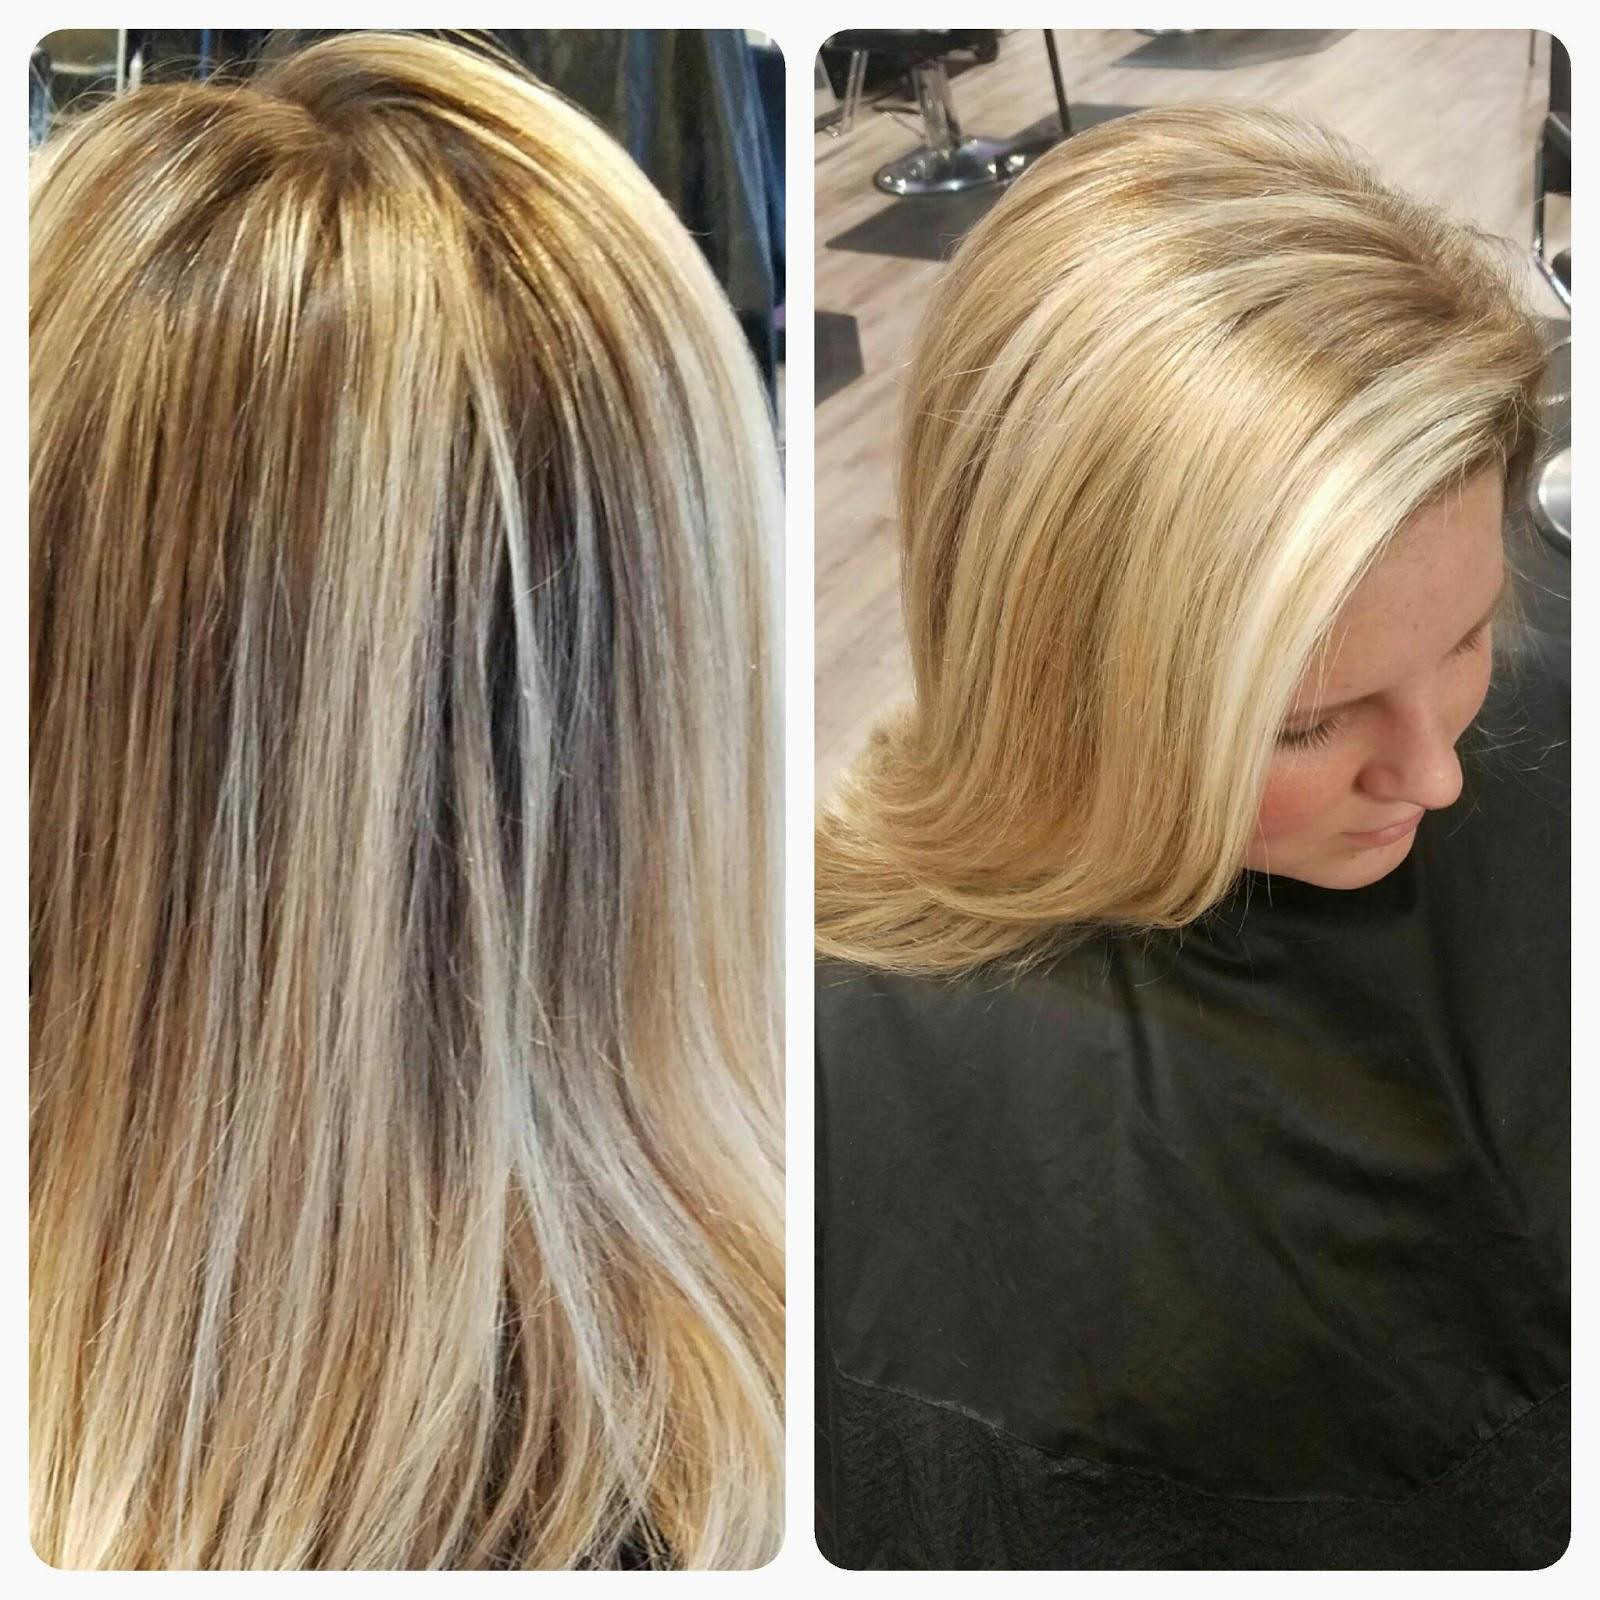 Color Melting With Foils Balayage Hair Stylist And Mua Stephani